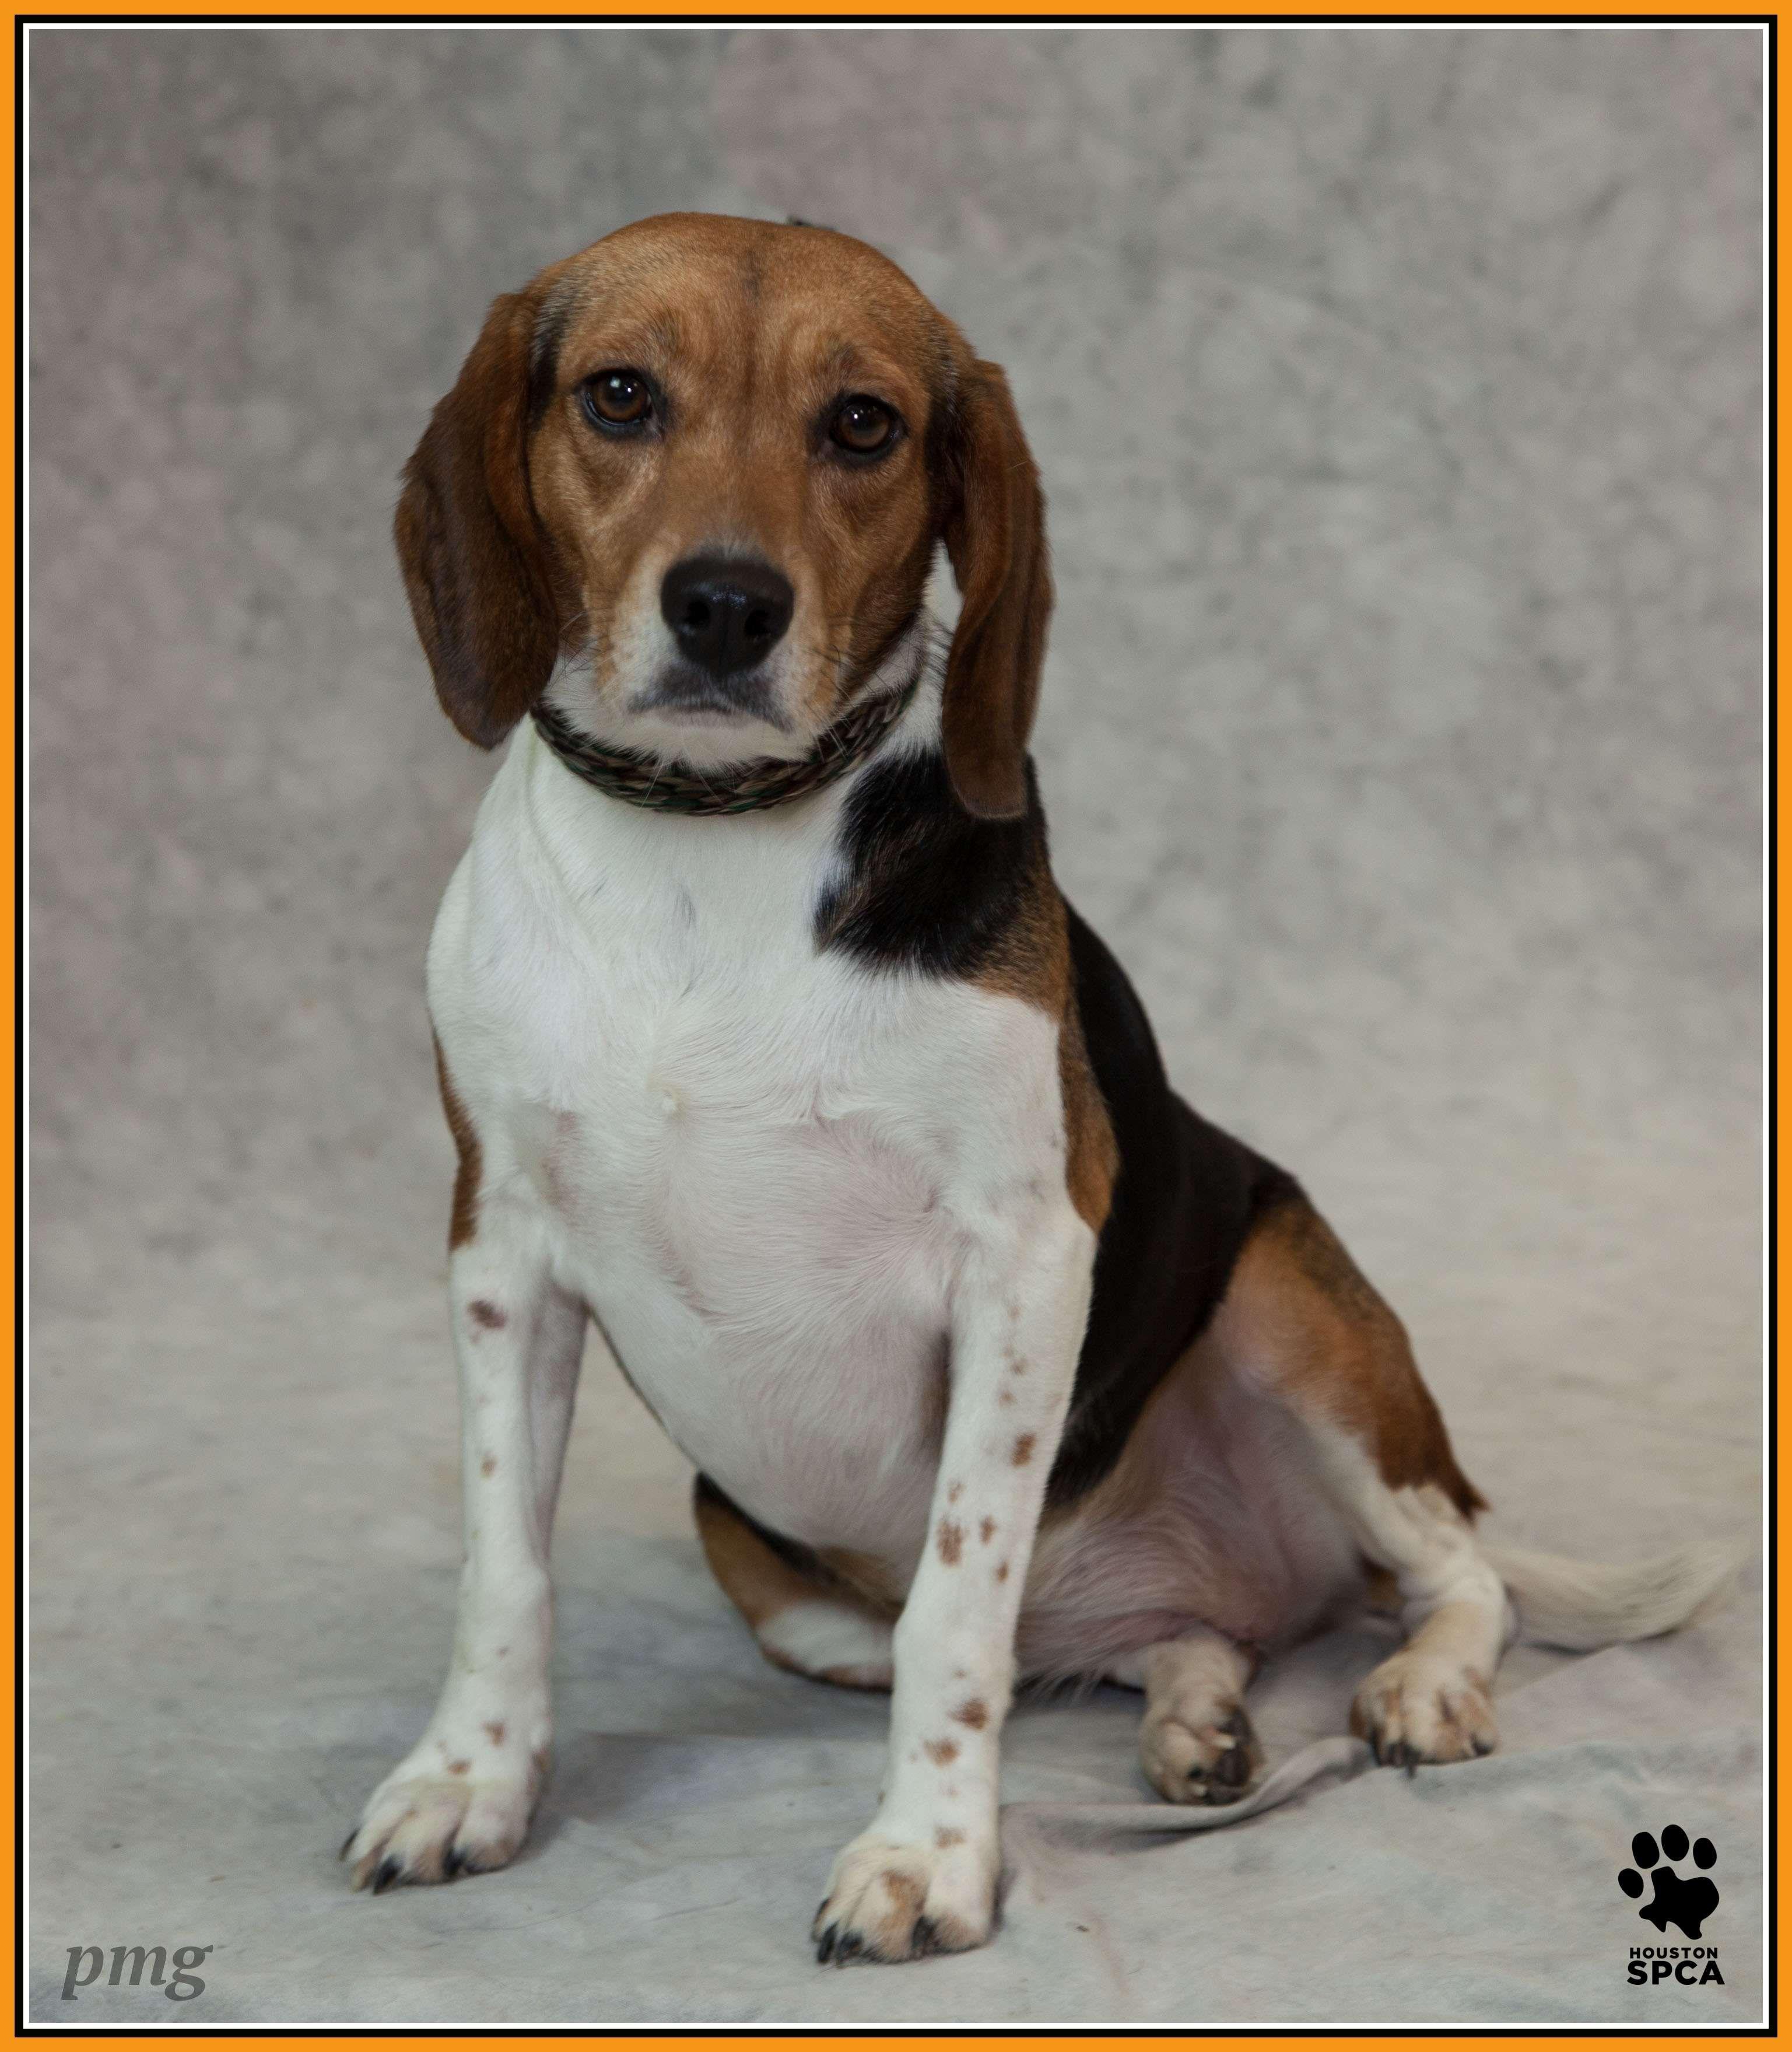 Cute Beagle Houston Spca Cute Beagles Animal Control Shelter